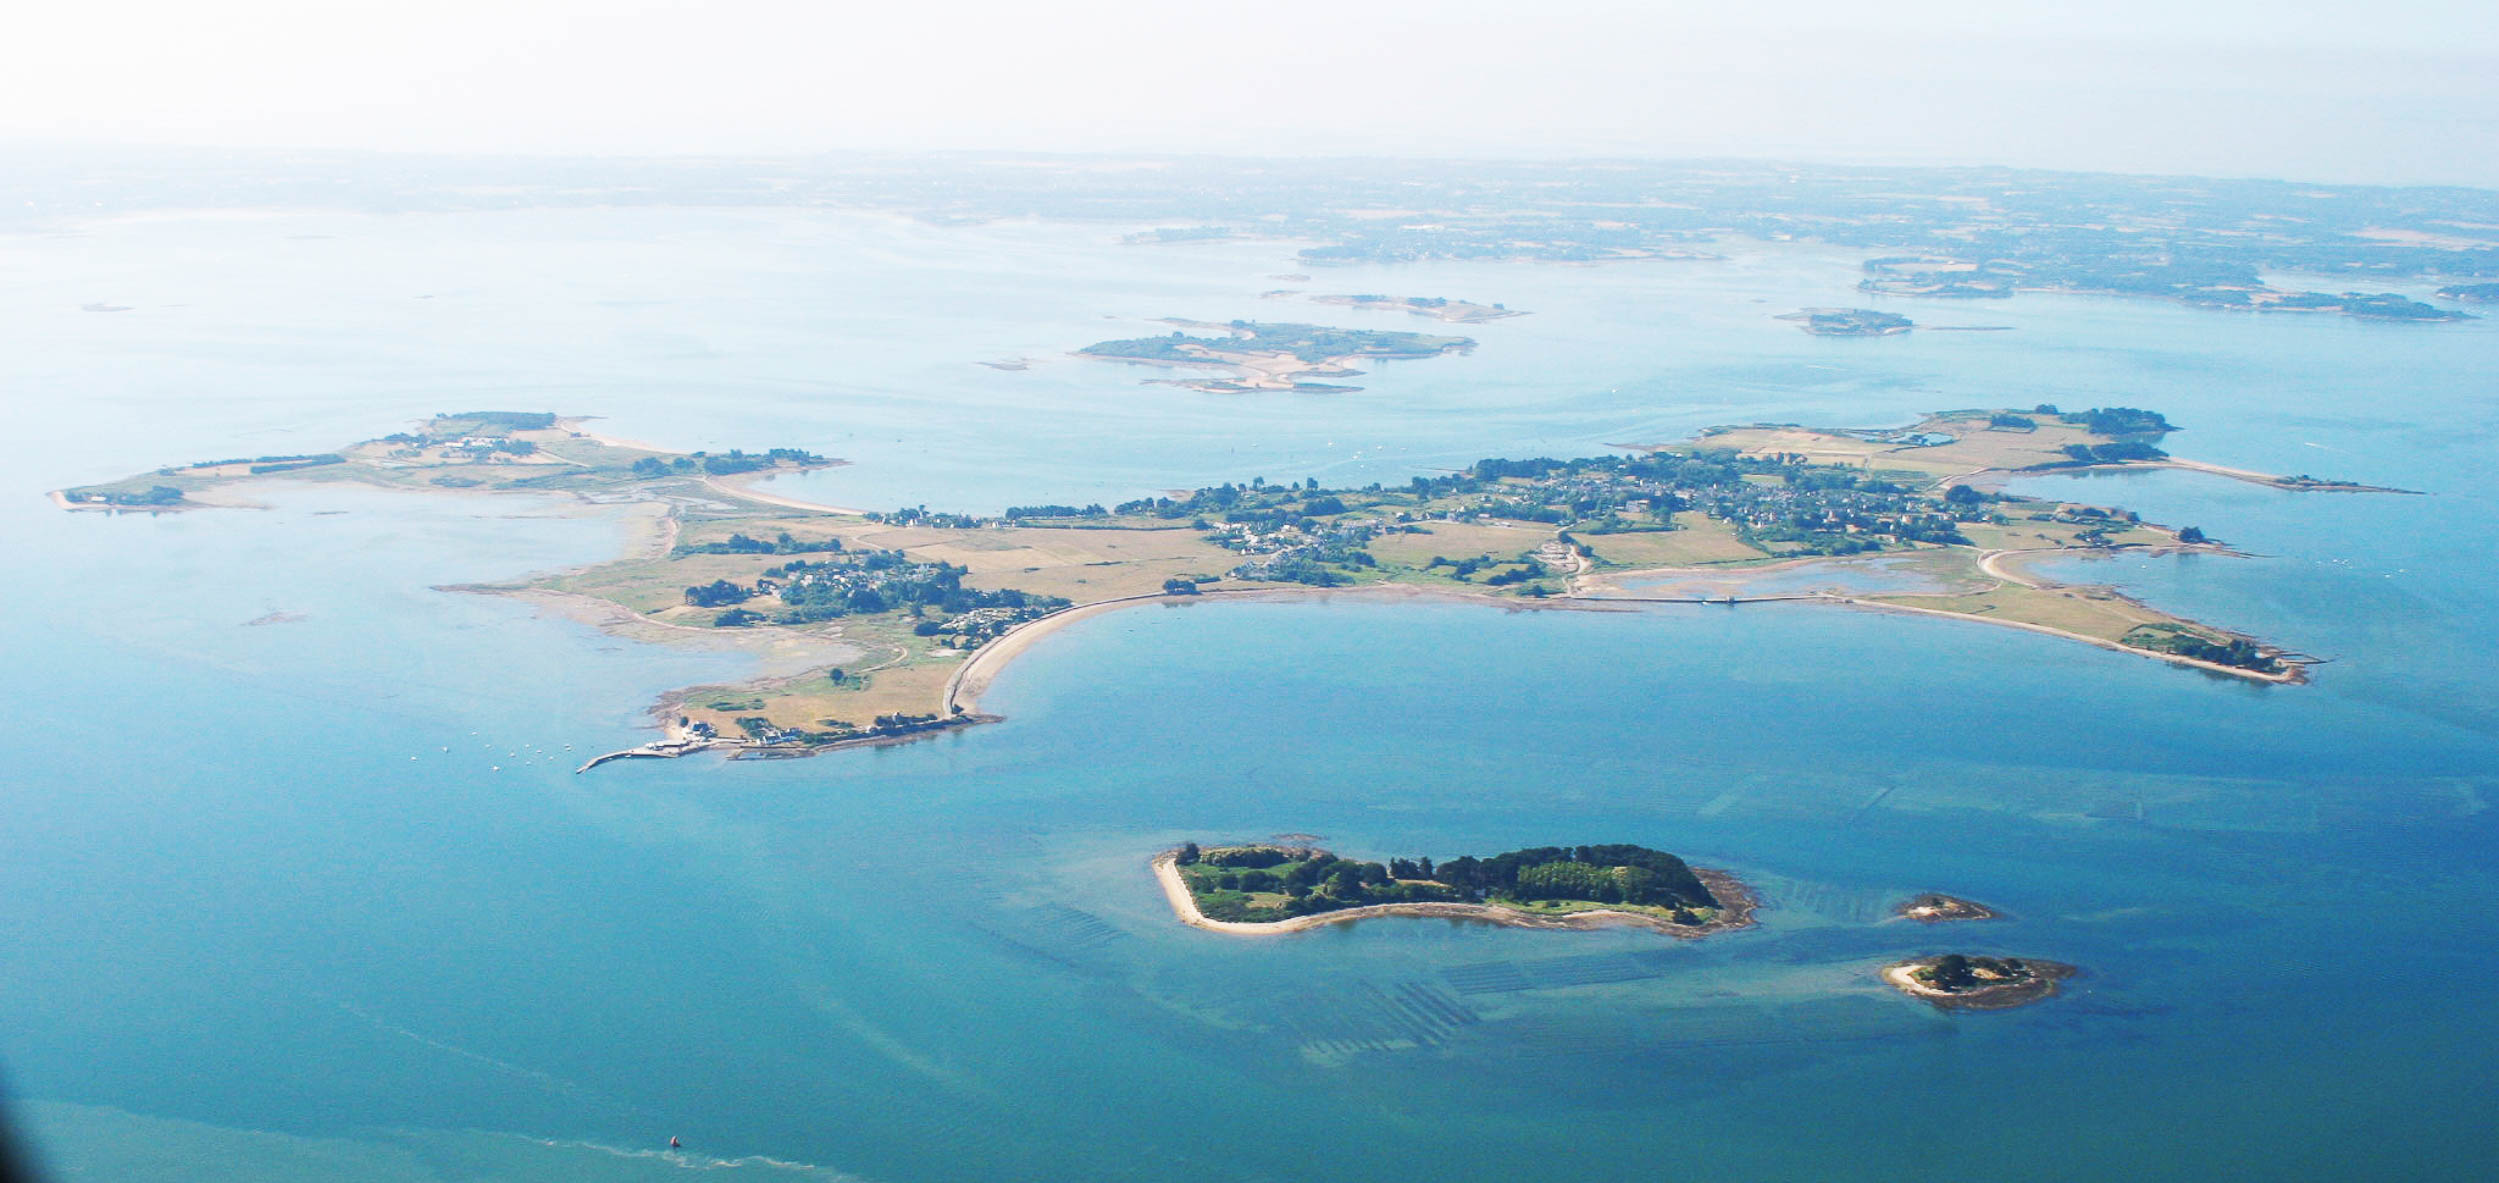 Escapade dans le Golfe du Morbihan #2